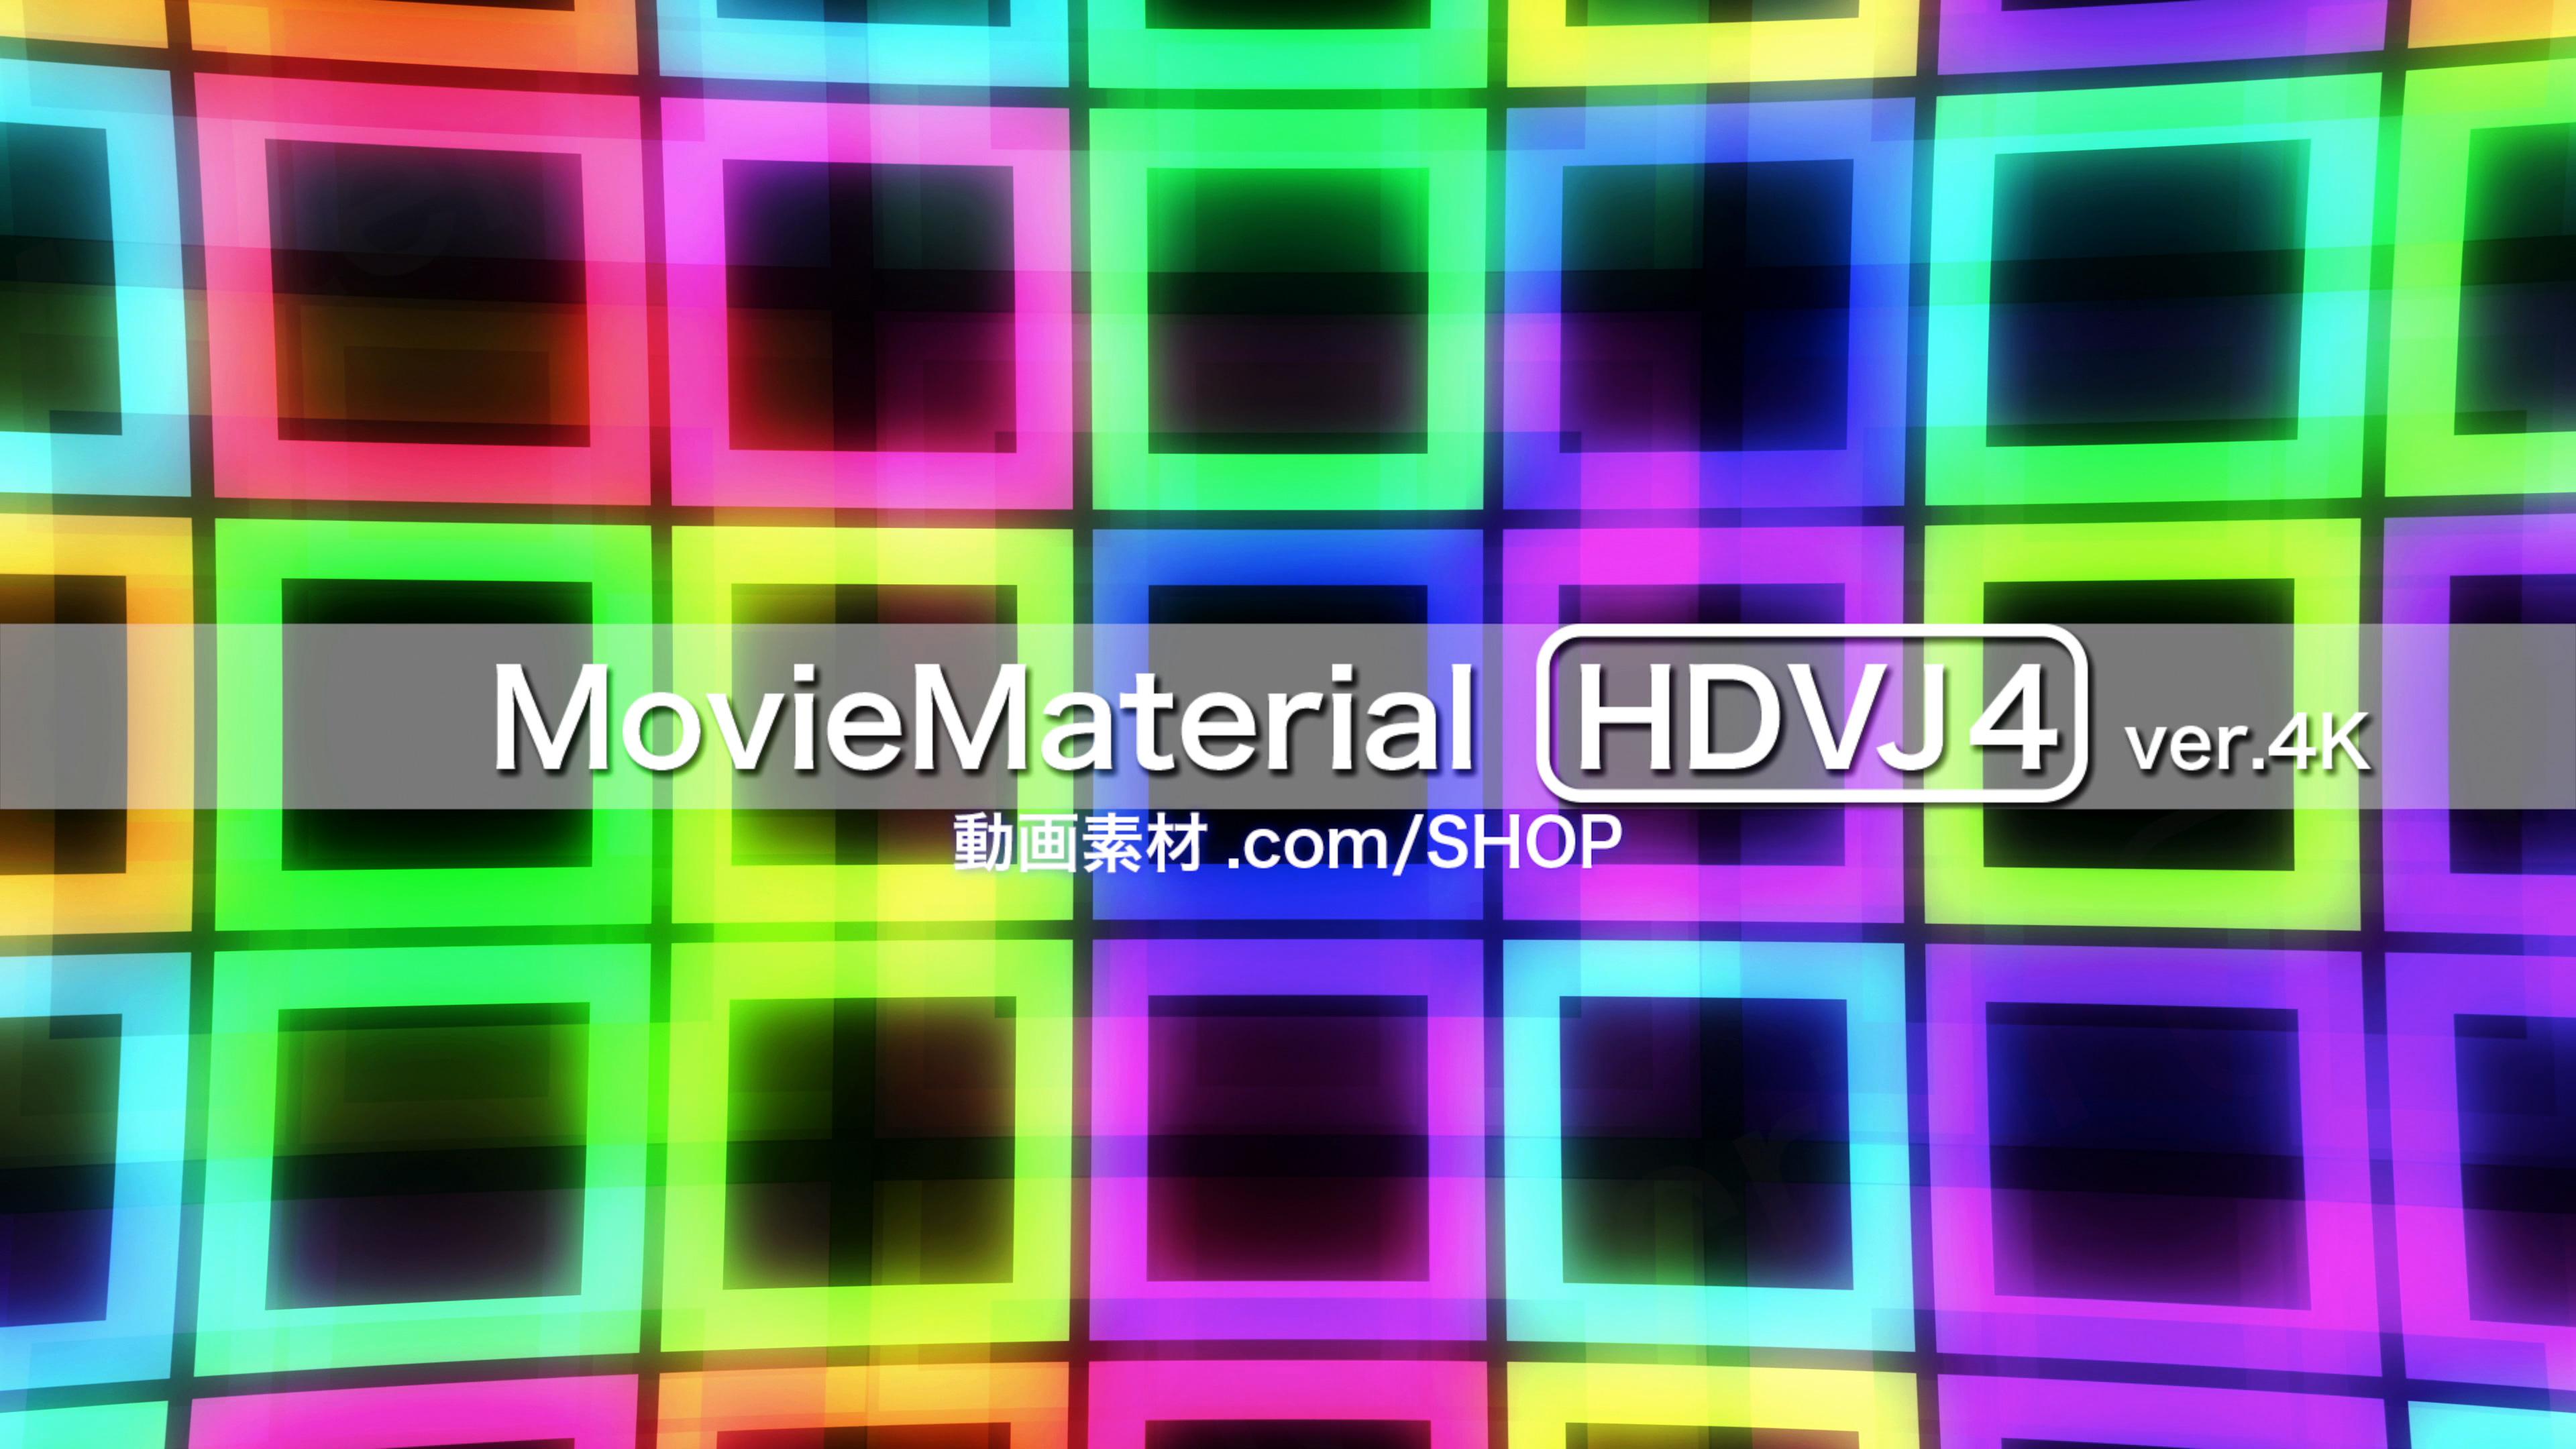 4K2Kループ動画素材集第4段【MovieMaterial HDVJ4 ver.4K】ロイヤリティフリー(著作権使用料無料)5